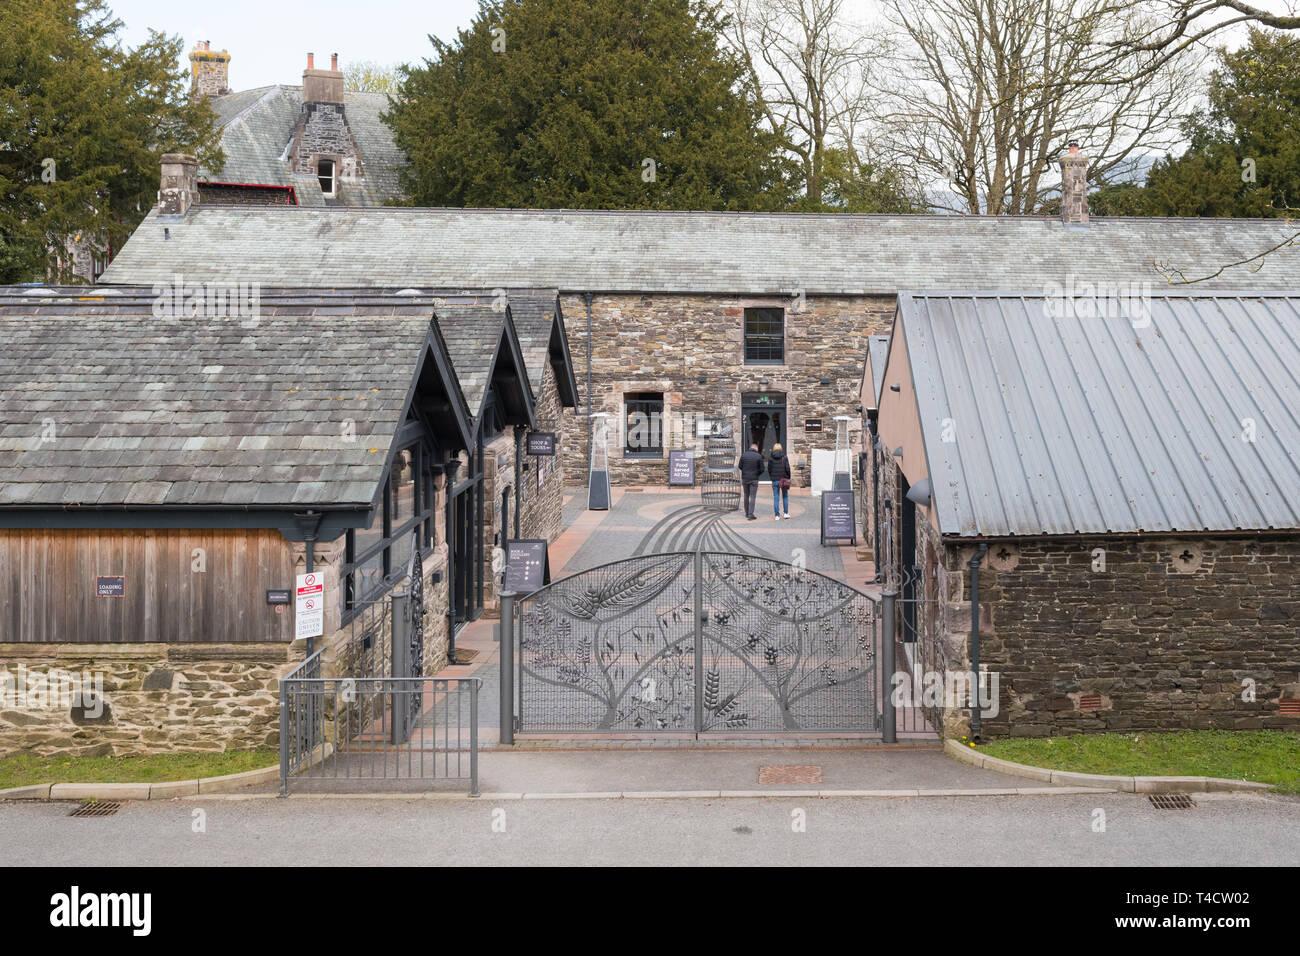 The Lakes Distillery, Bassenthwaite, Cumbria, England, UK Stock Photo